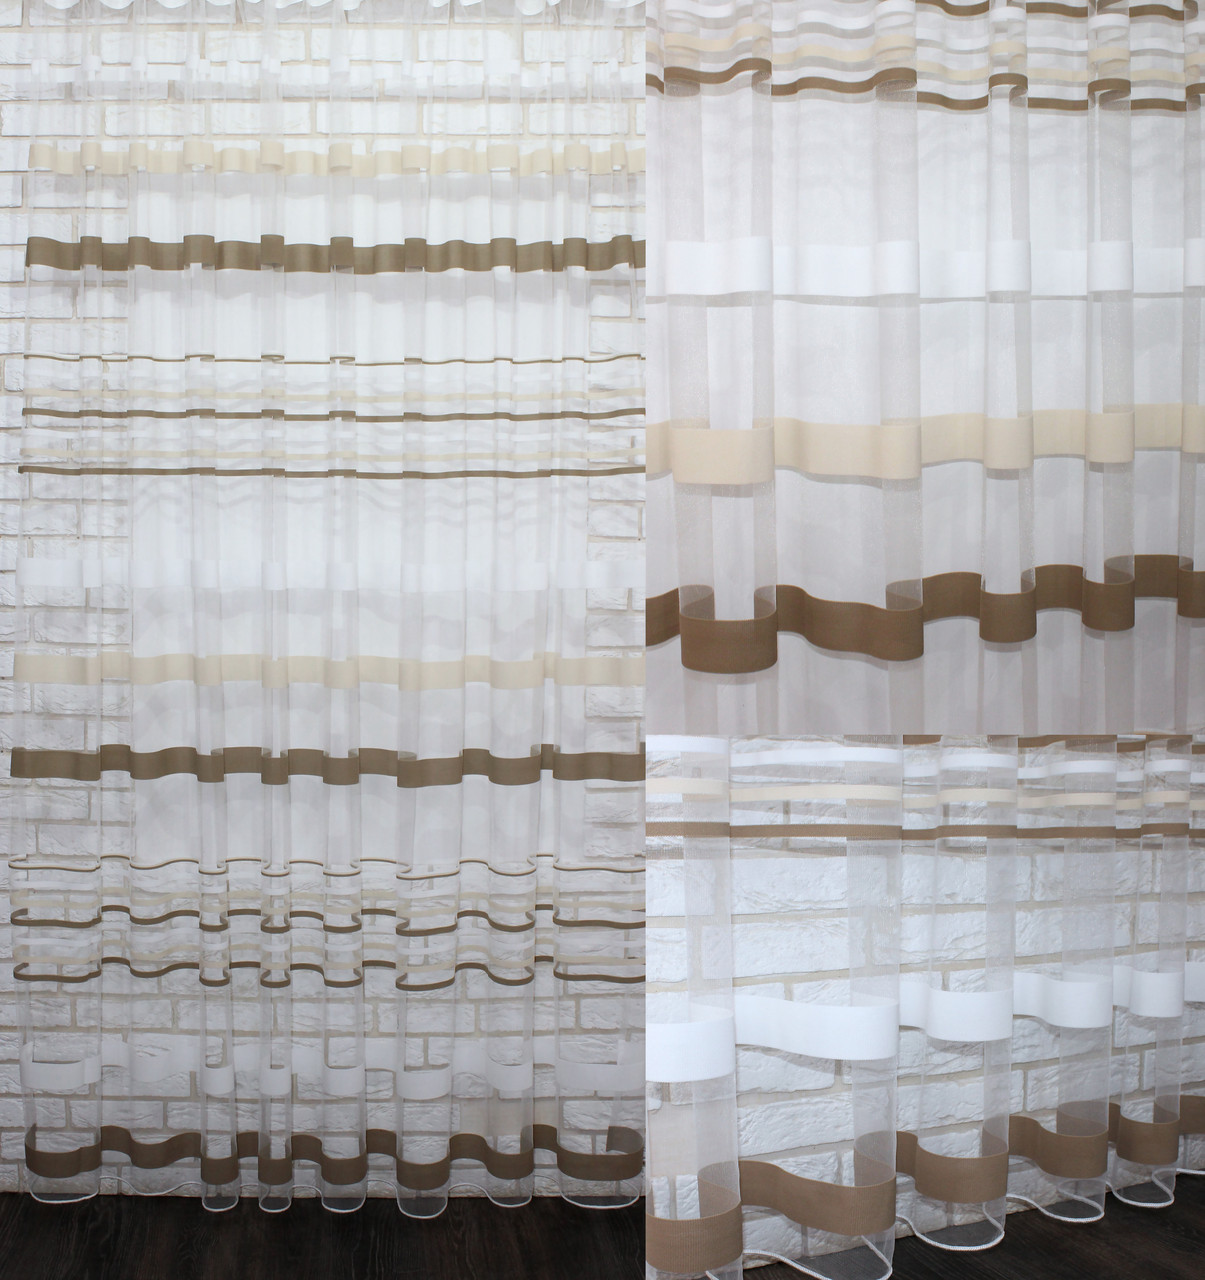 Тюль фатин полоса,(3х2,5) цвет хаки. Код 524т 40-180